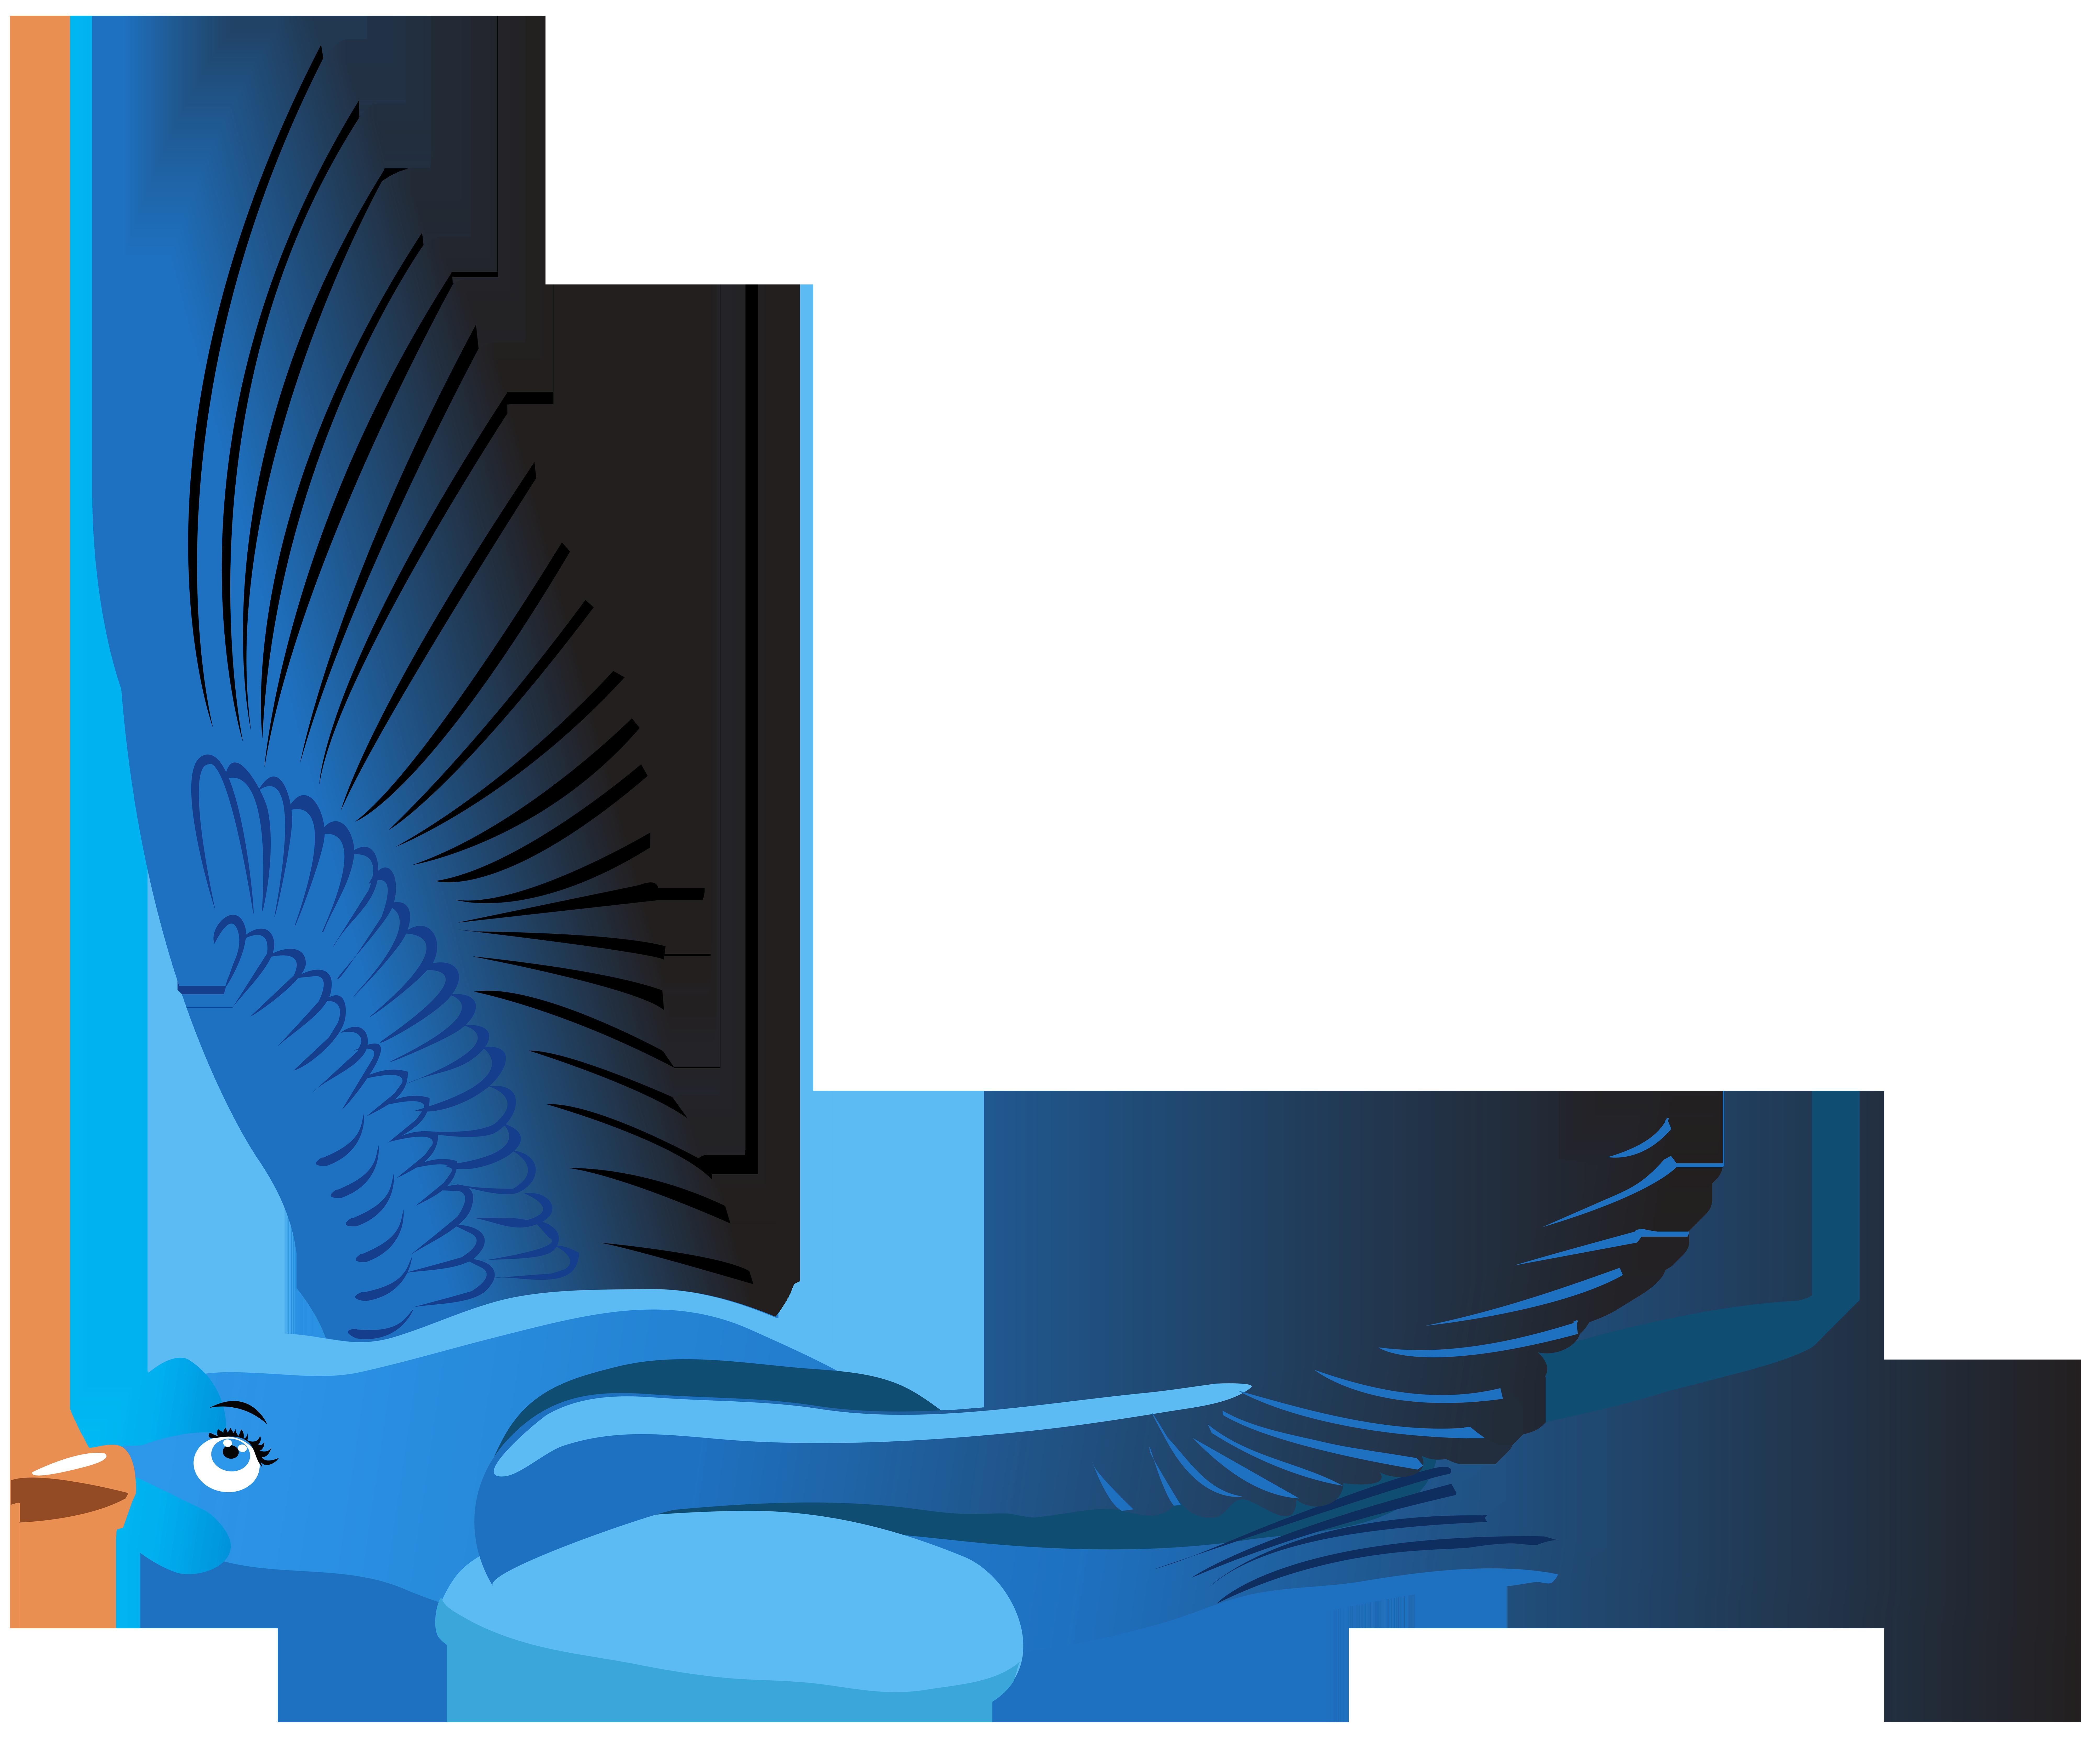 8000x6747 Blue Bird Cartoon Transparent Clip Art Png Imageu200b Gallery